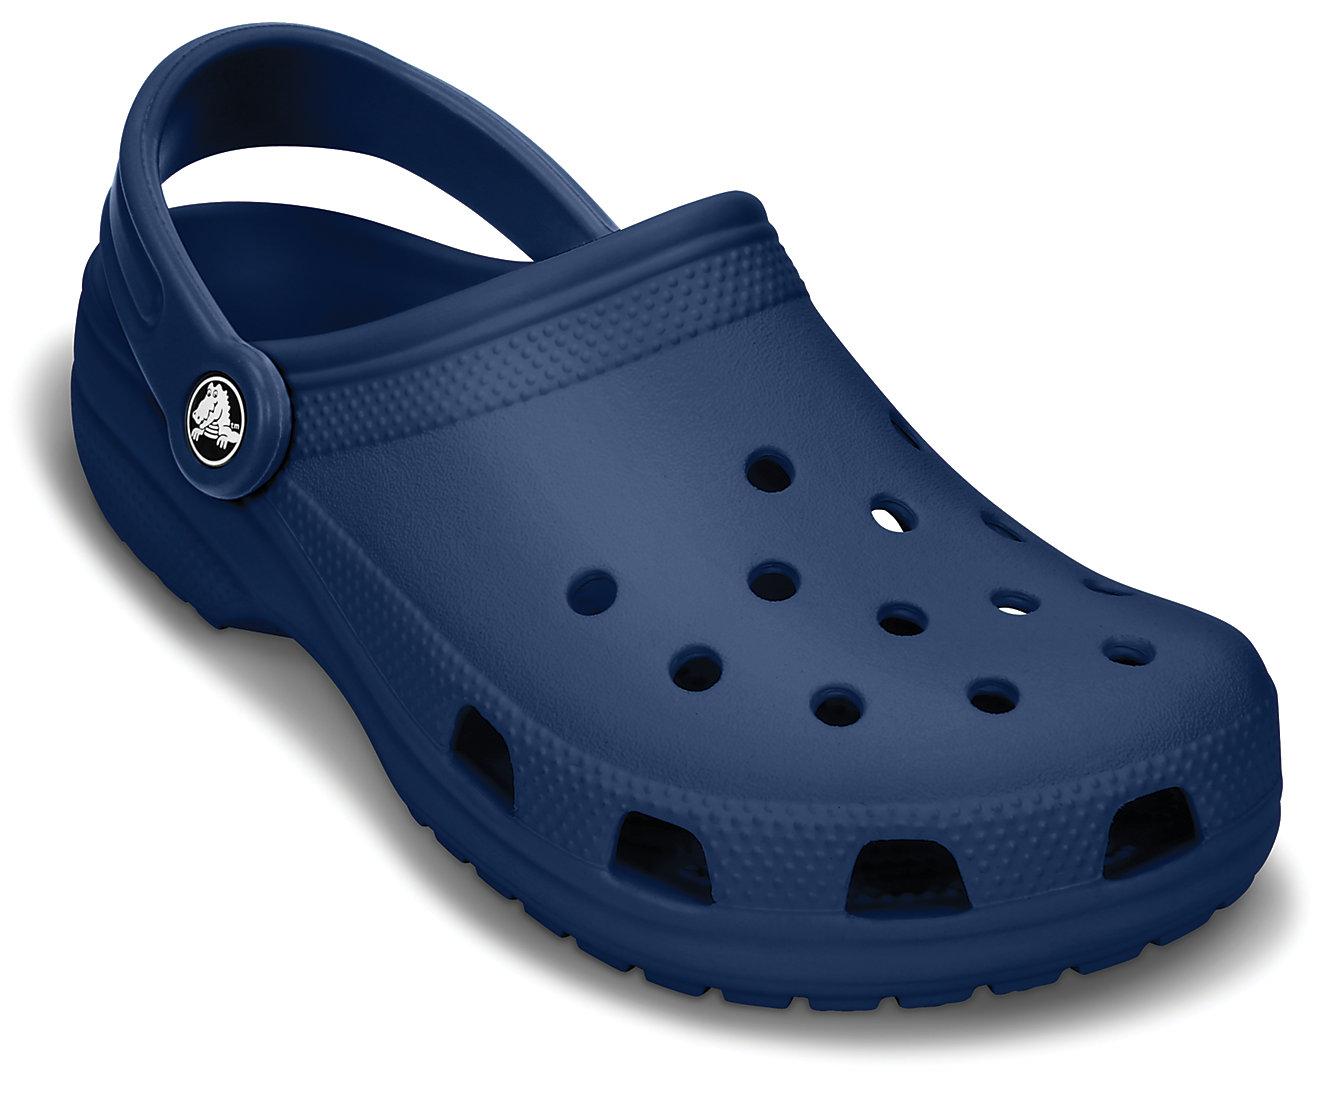 Crocs Classic Clog 10001-410 Navy Μπλε σκούρο